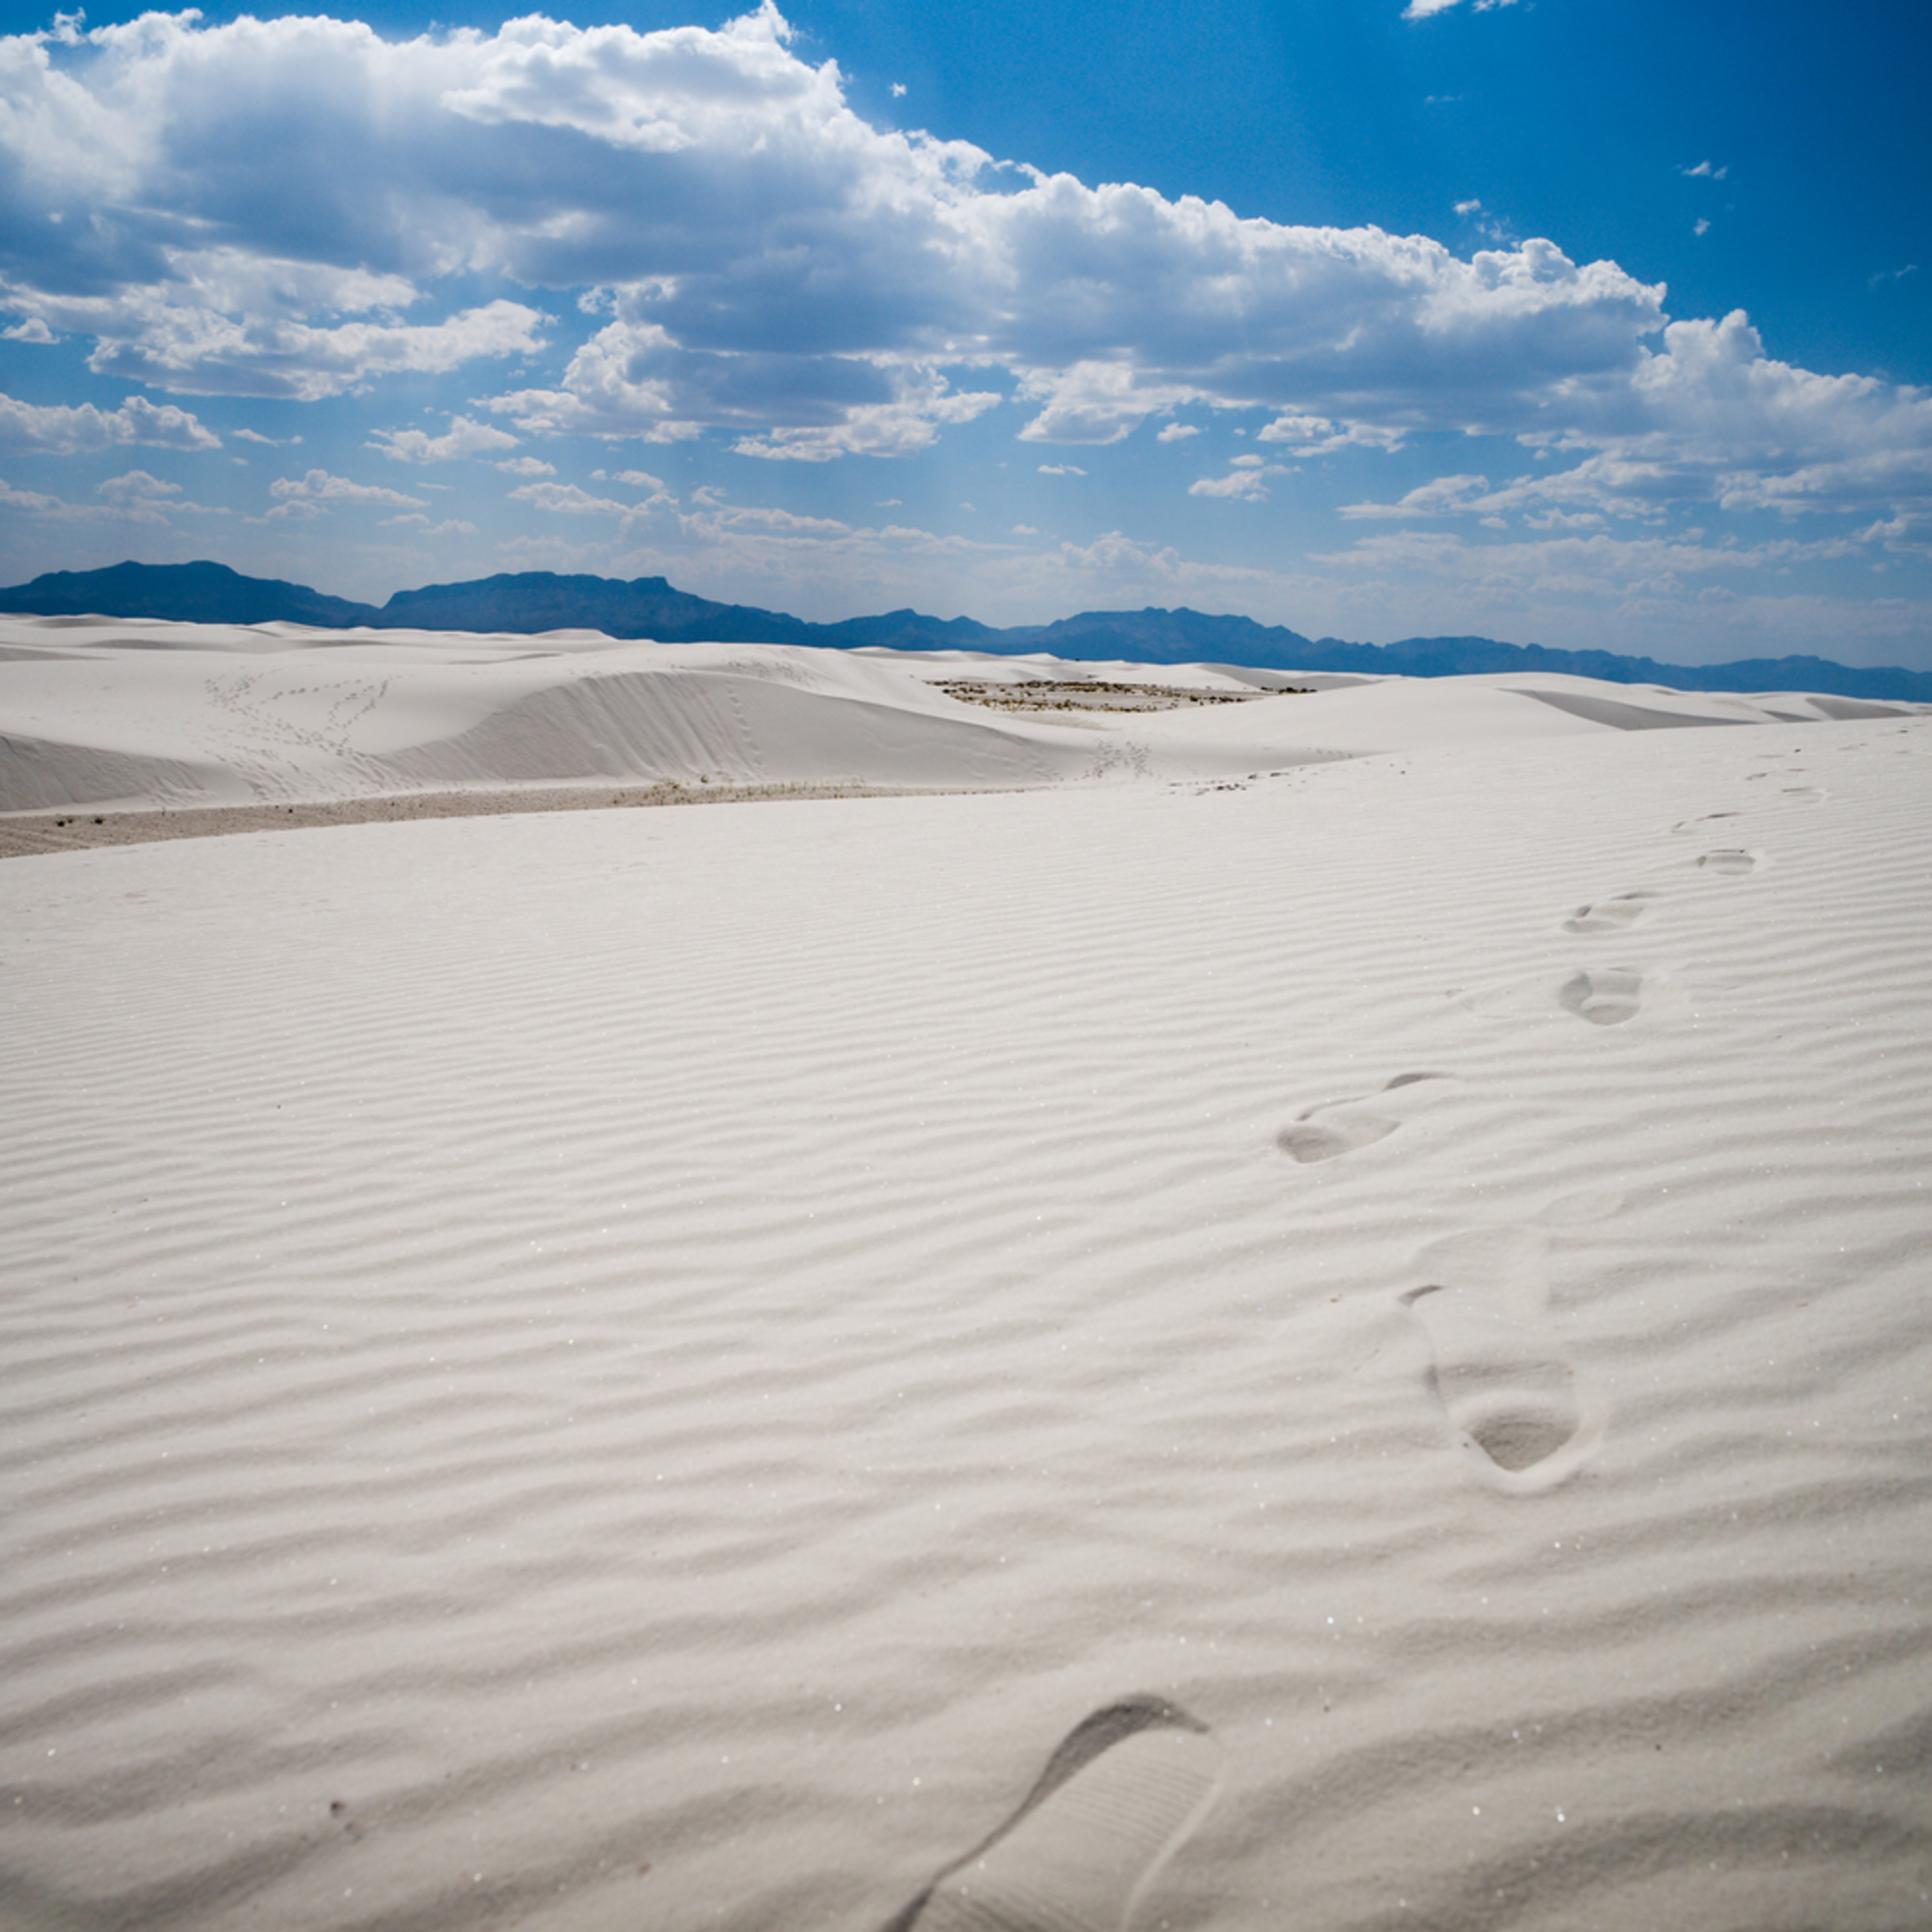 White sands wonders icbycm